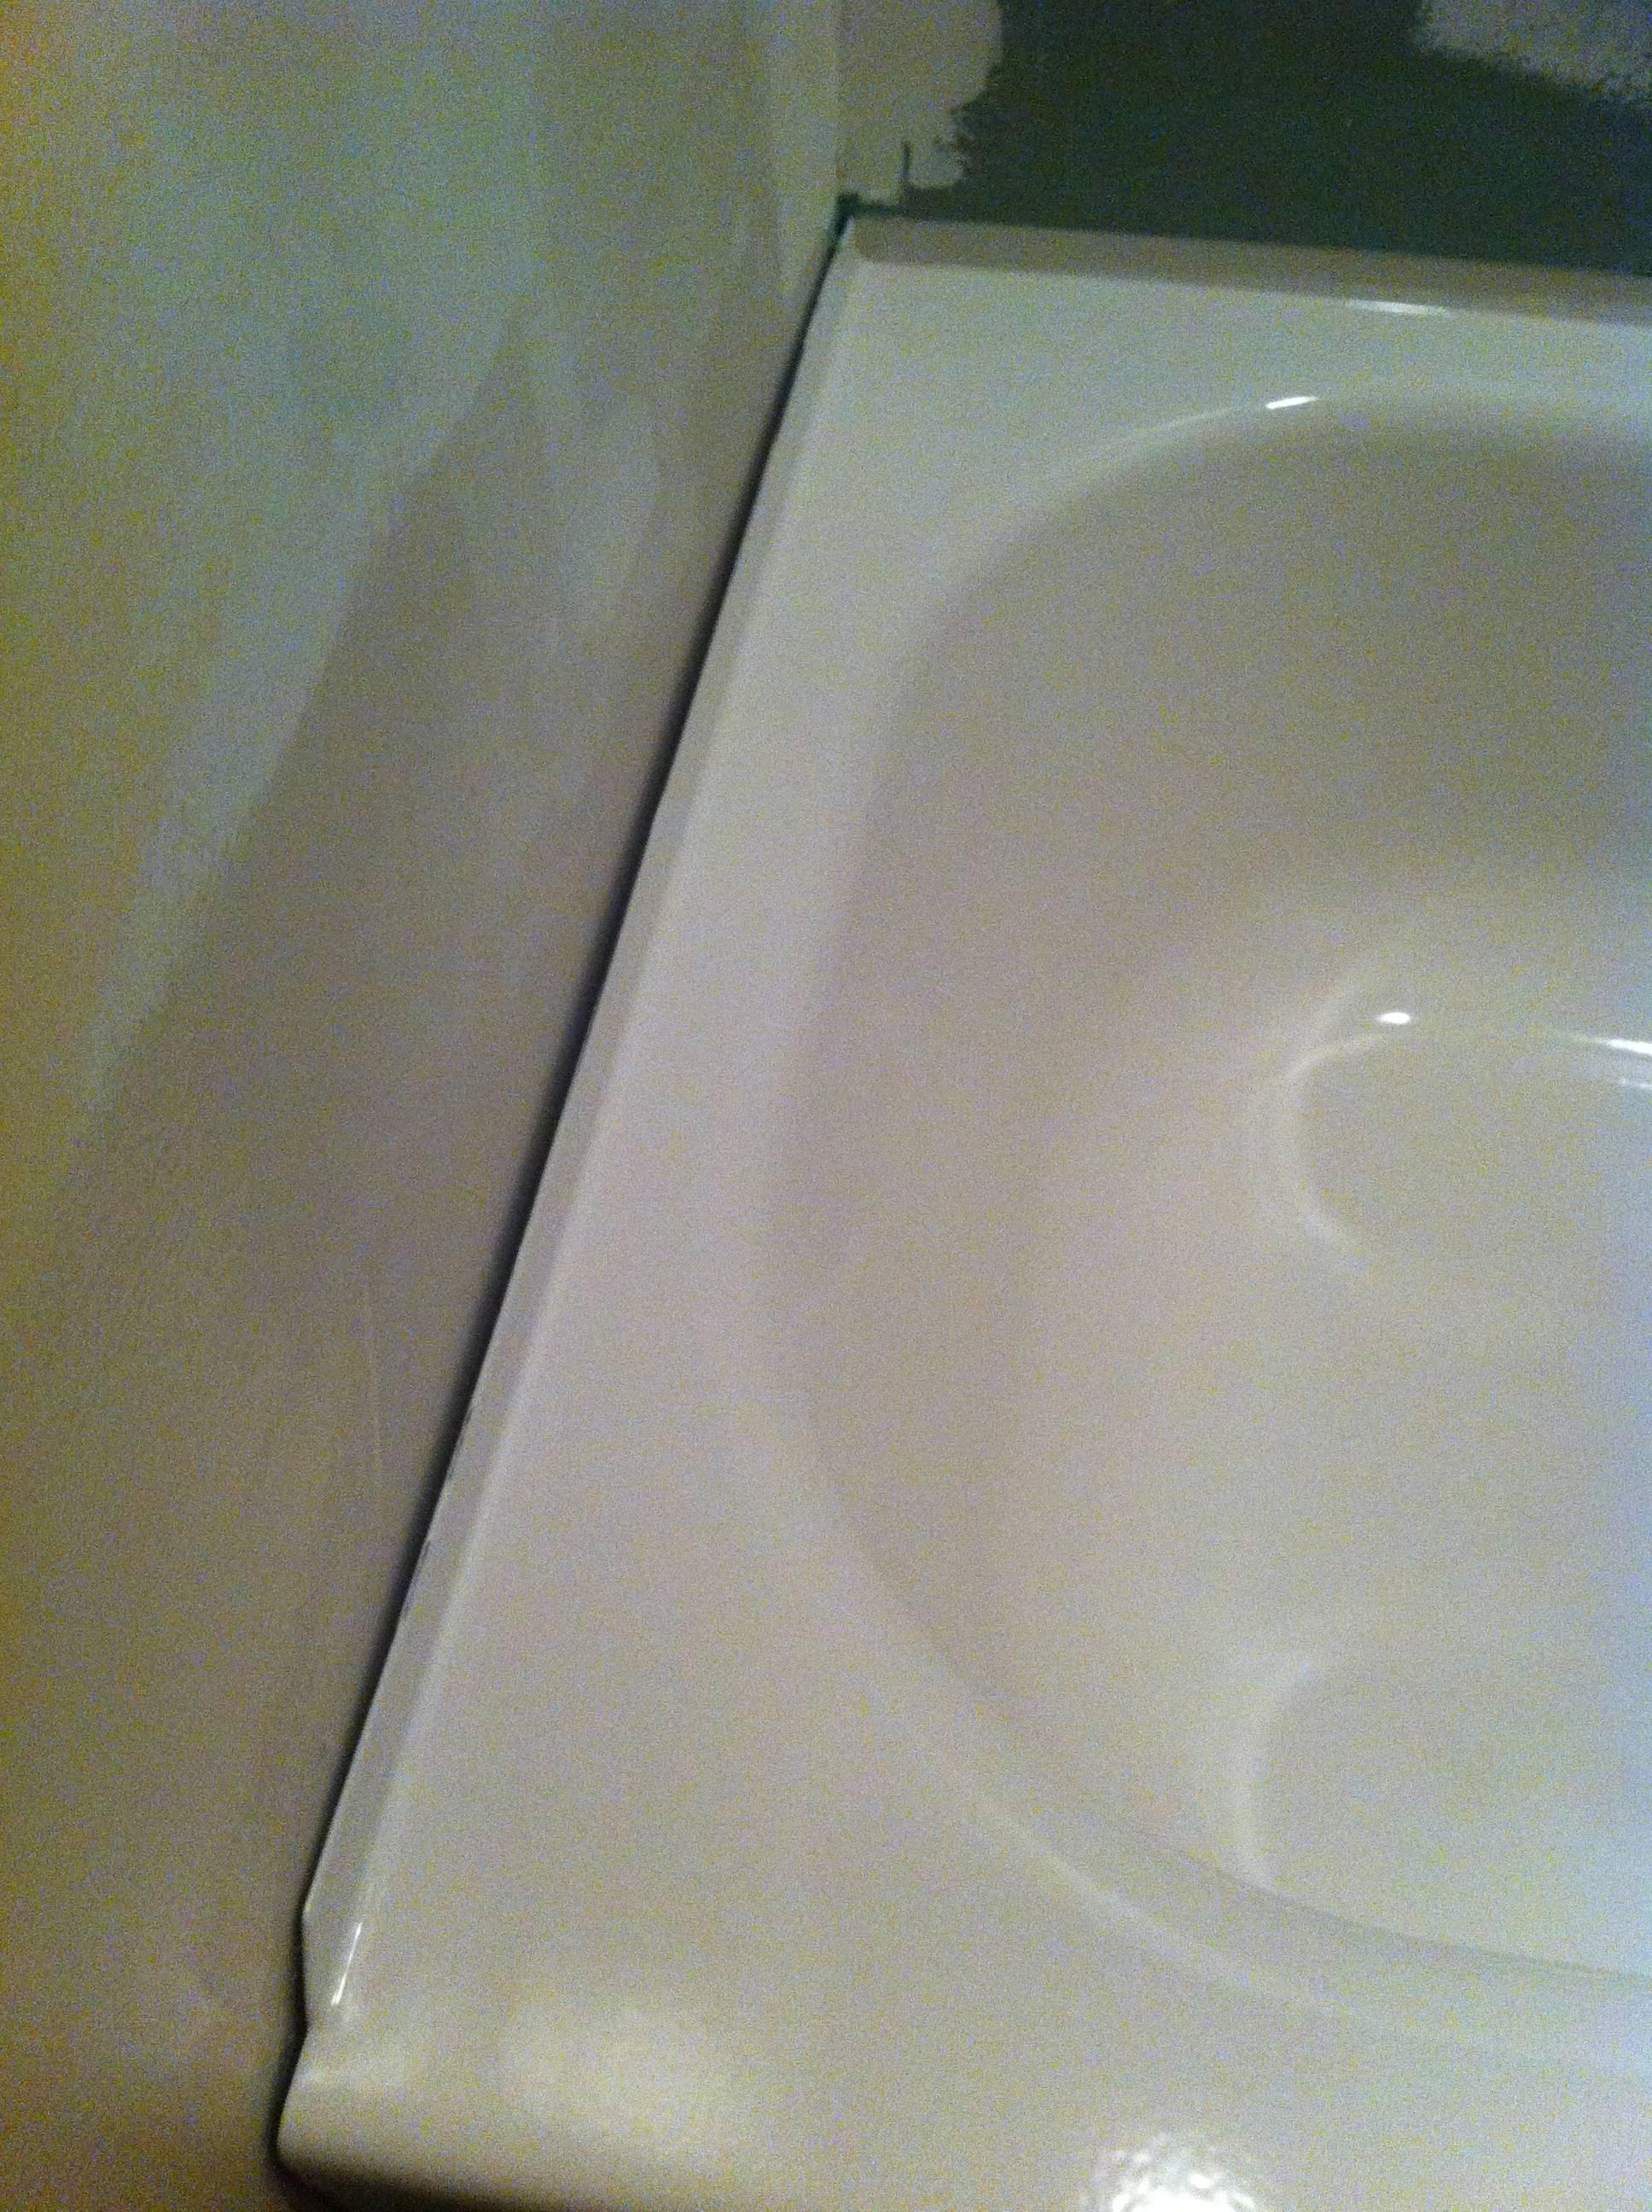 Tile Around Bathtub Over Drywall Vs Vapor Shield